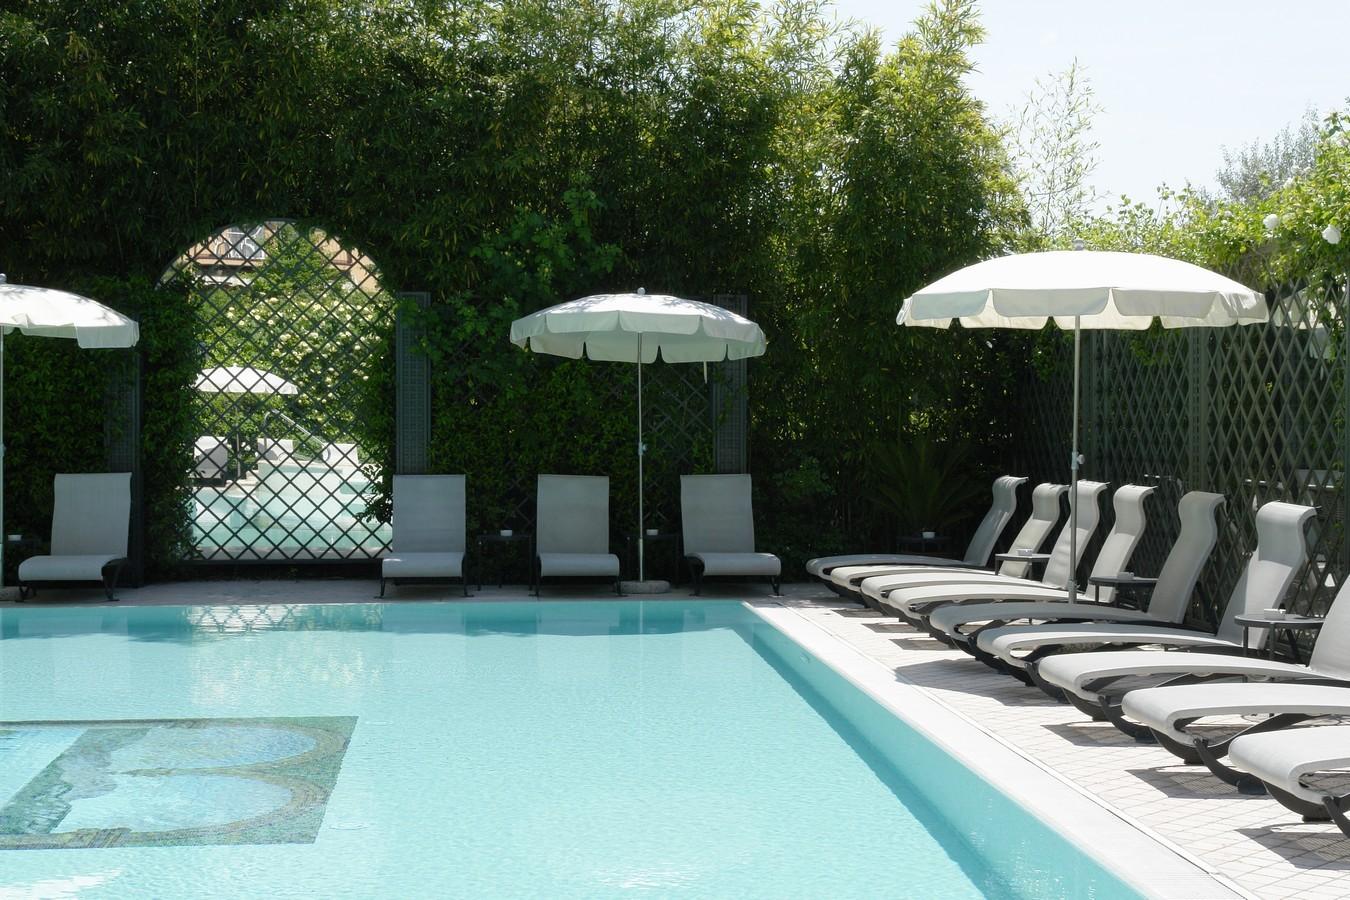 Hotel San Pietro - Bardolino - Hotels Resort & Spa